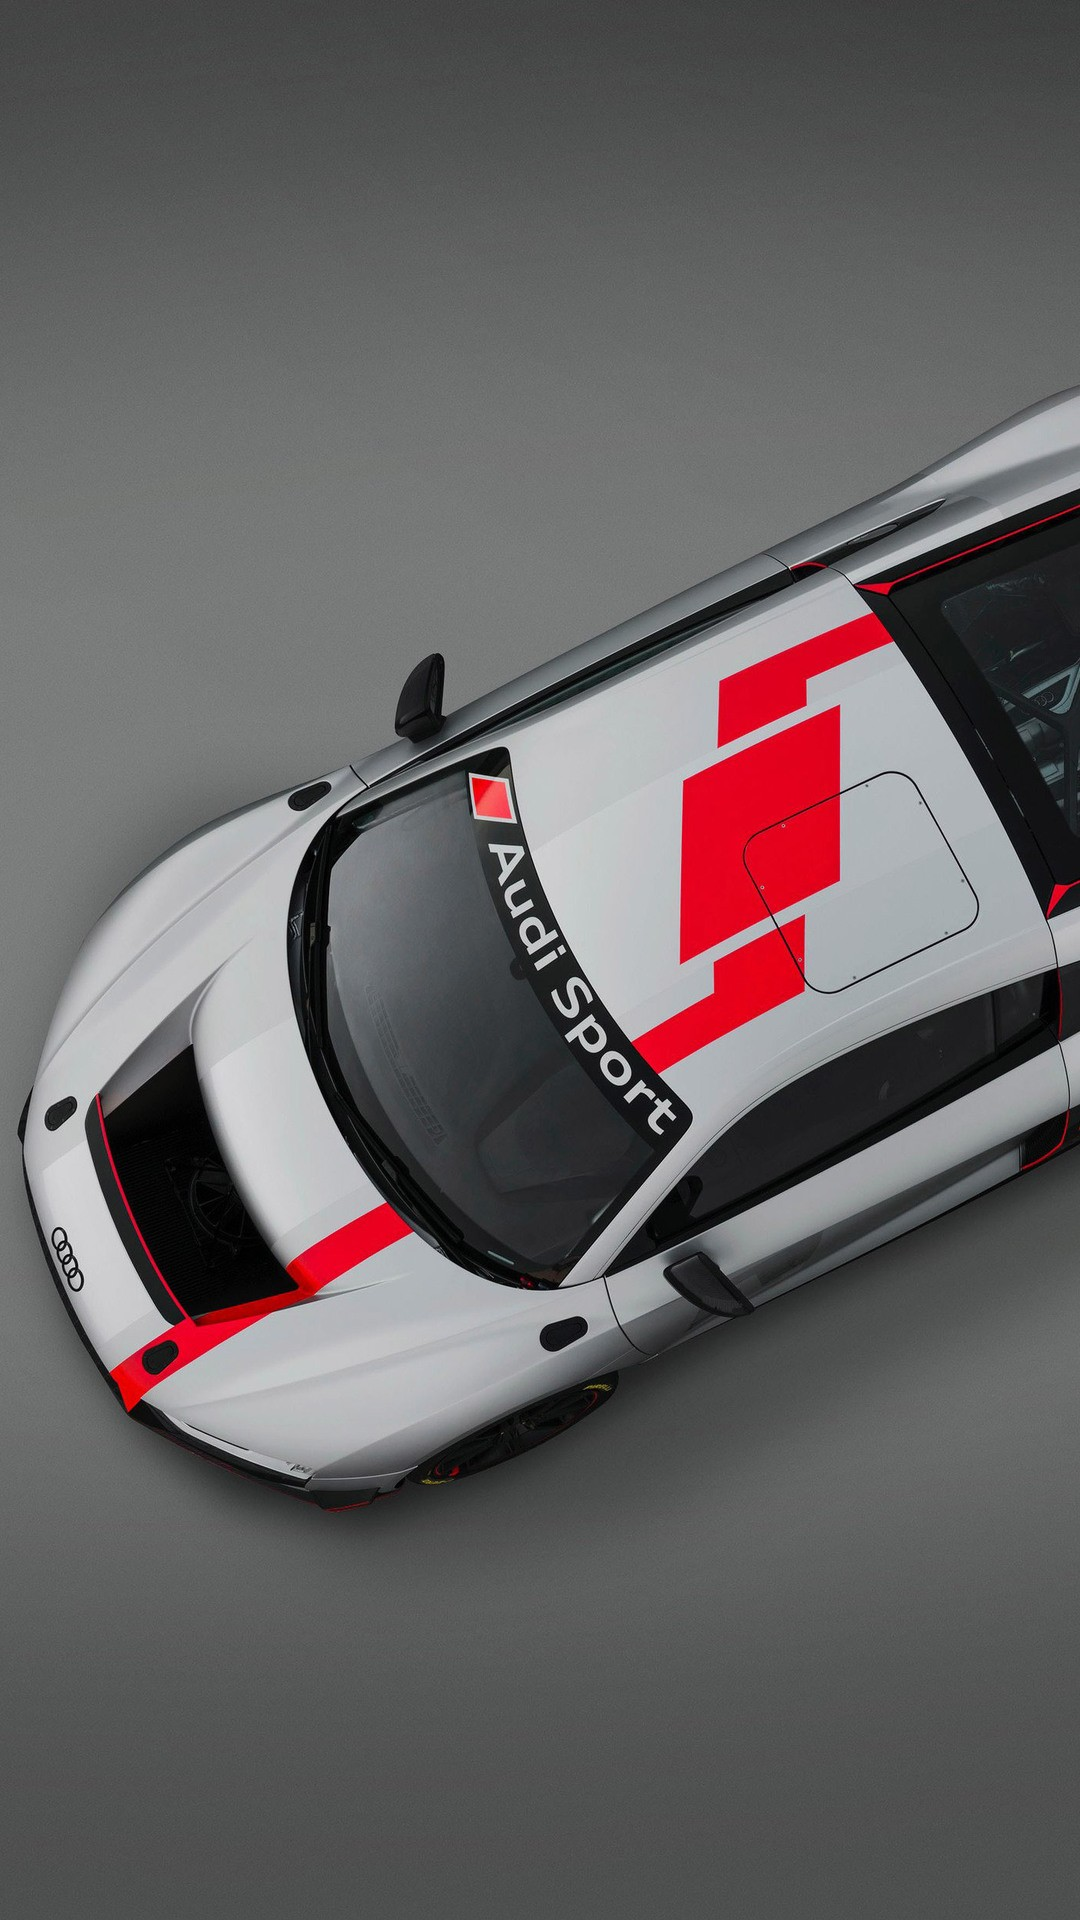 Audi R8 Lms Gt4 Top View Qhd Wallpaper 1080x1920